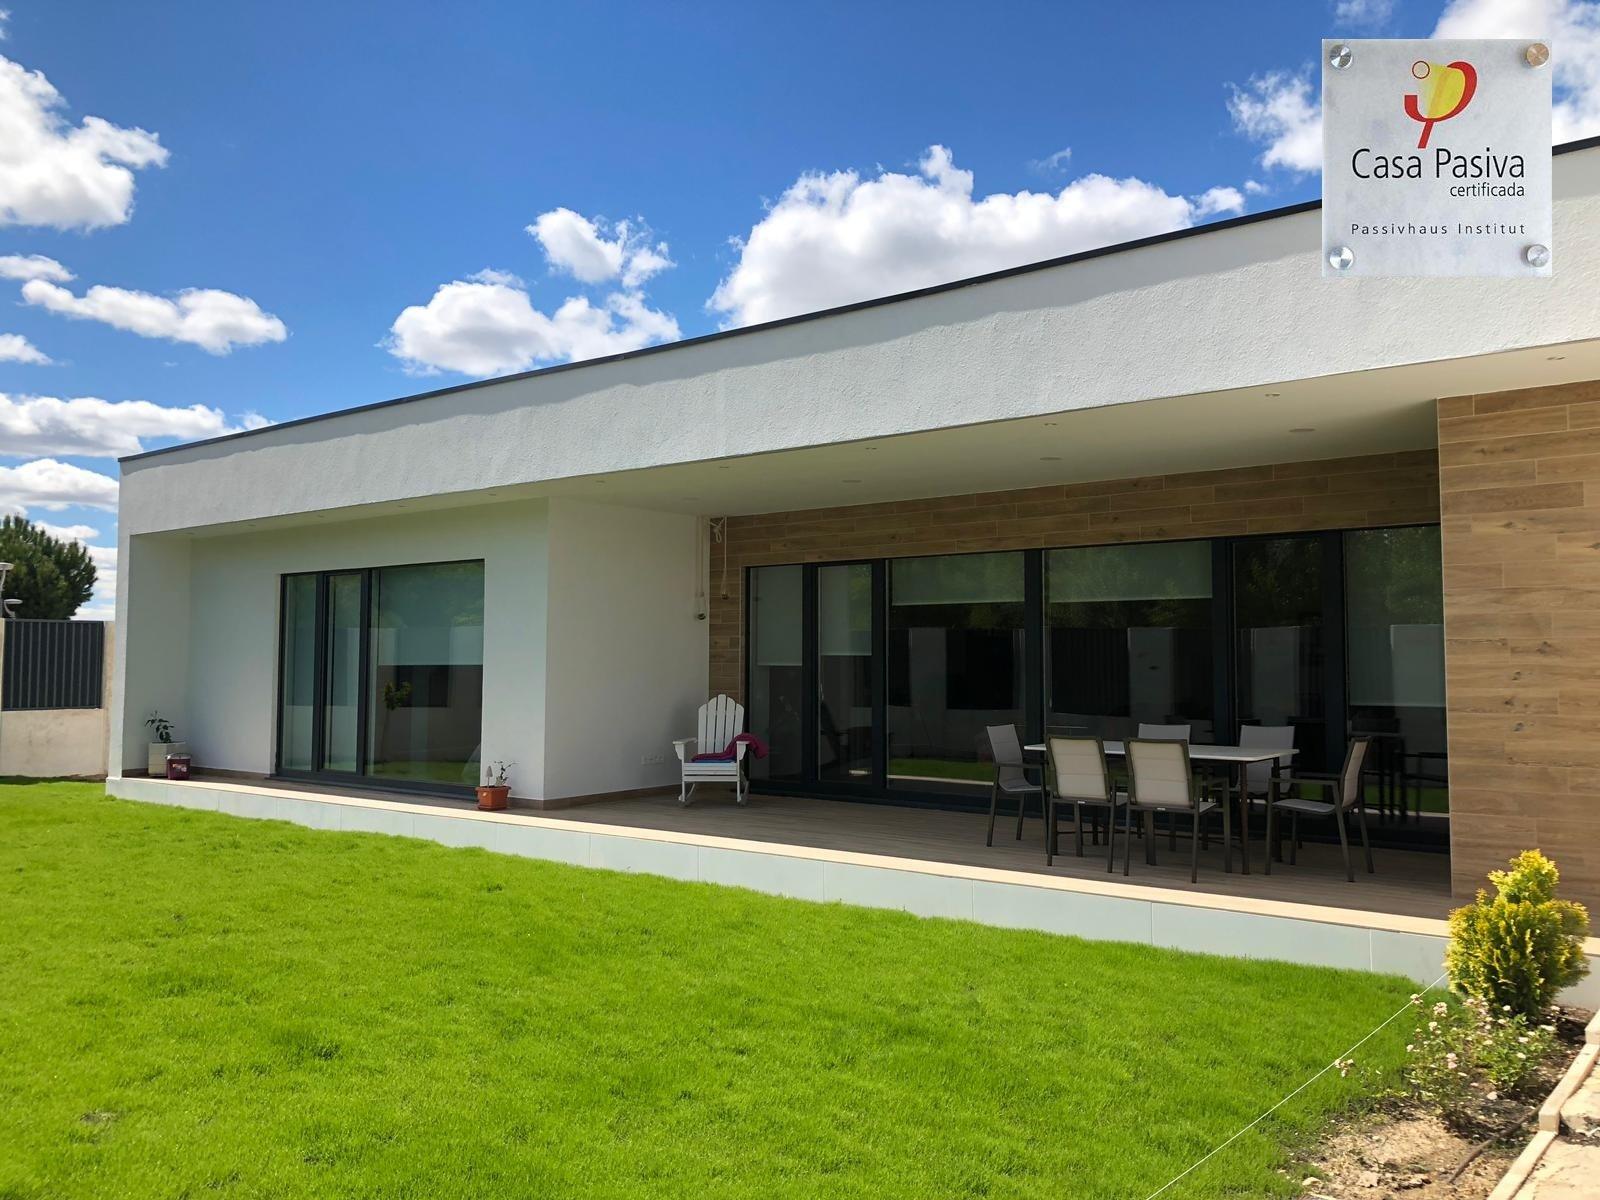 Vivienda Passivhaus en Valladolid Certificada